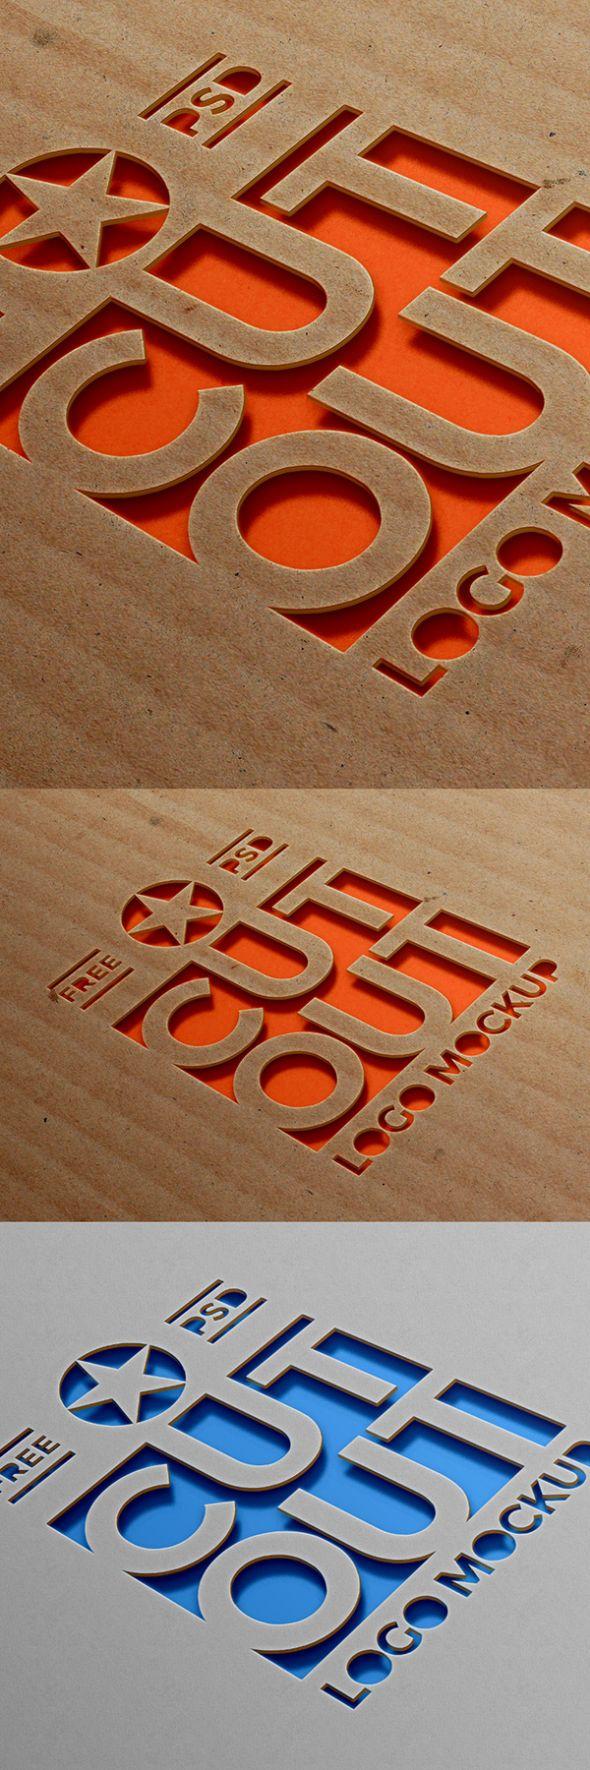 cardboard-cutout-logo-mockup-graphicfuel